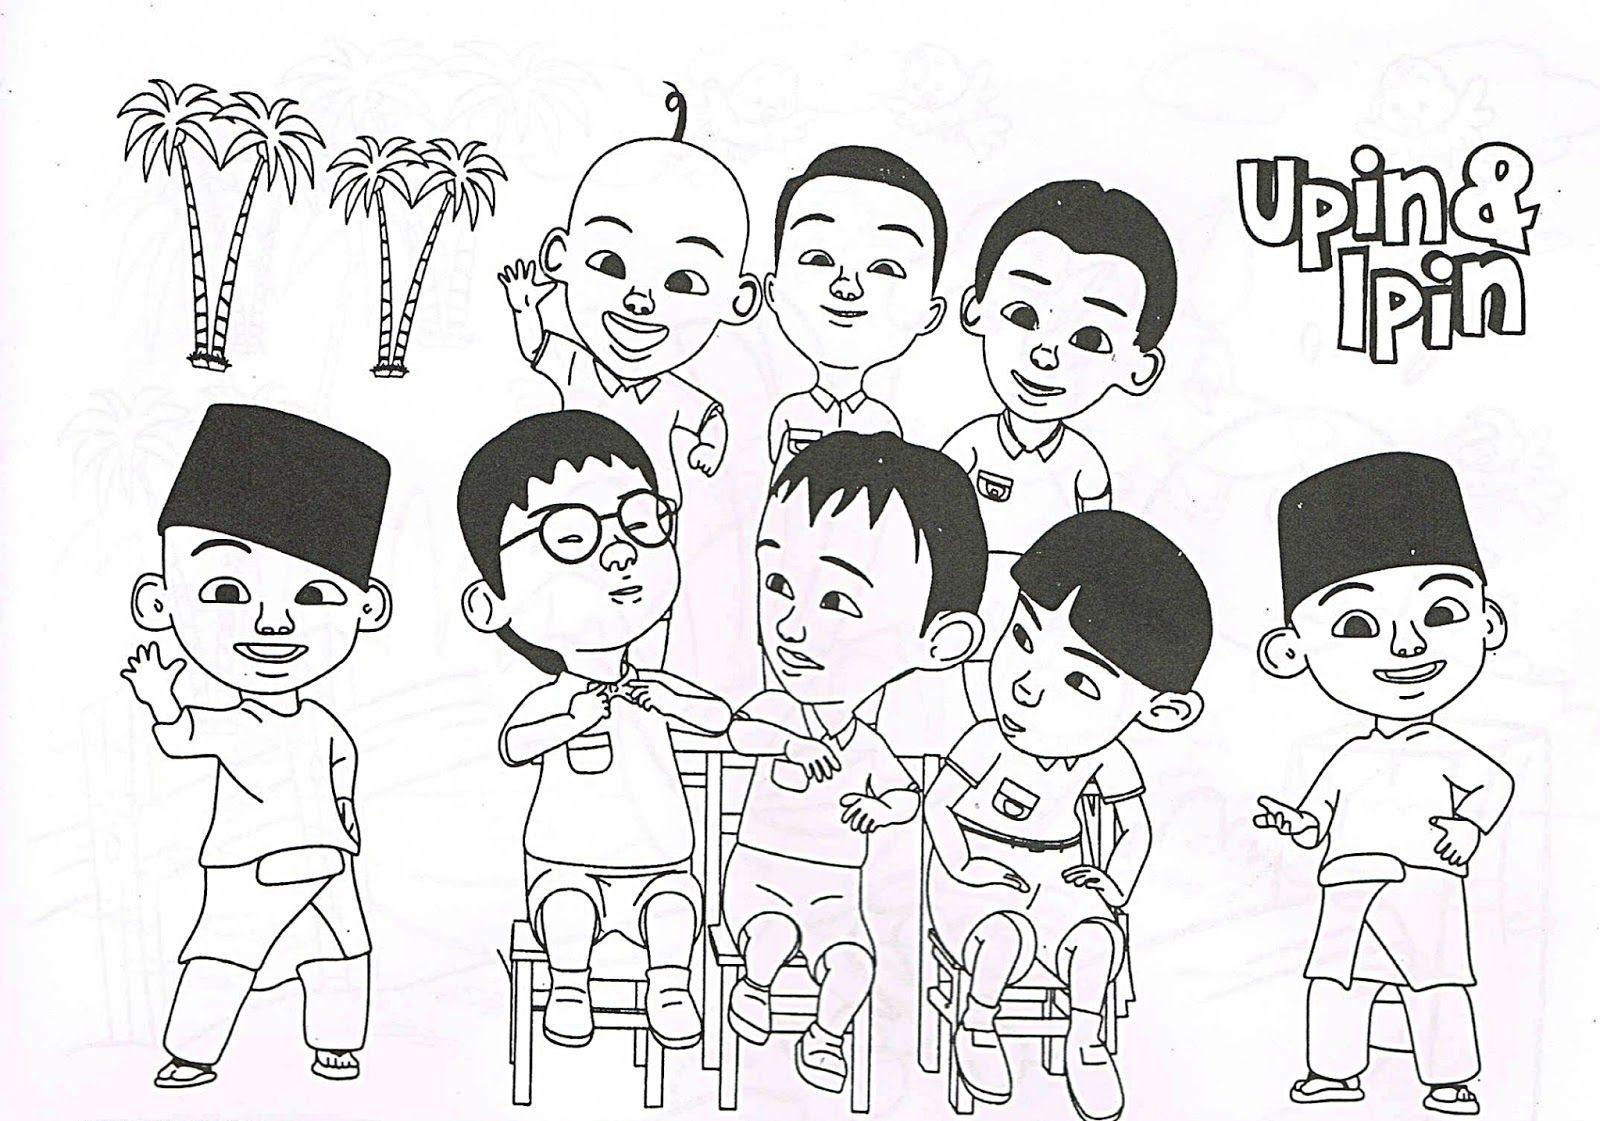 Mari Mewarna Bersama Upin Coloring Pages For Boys